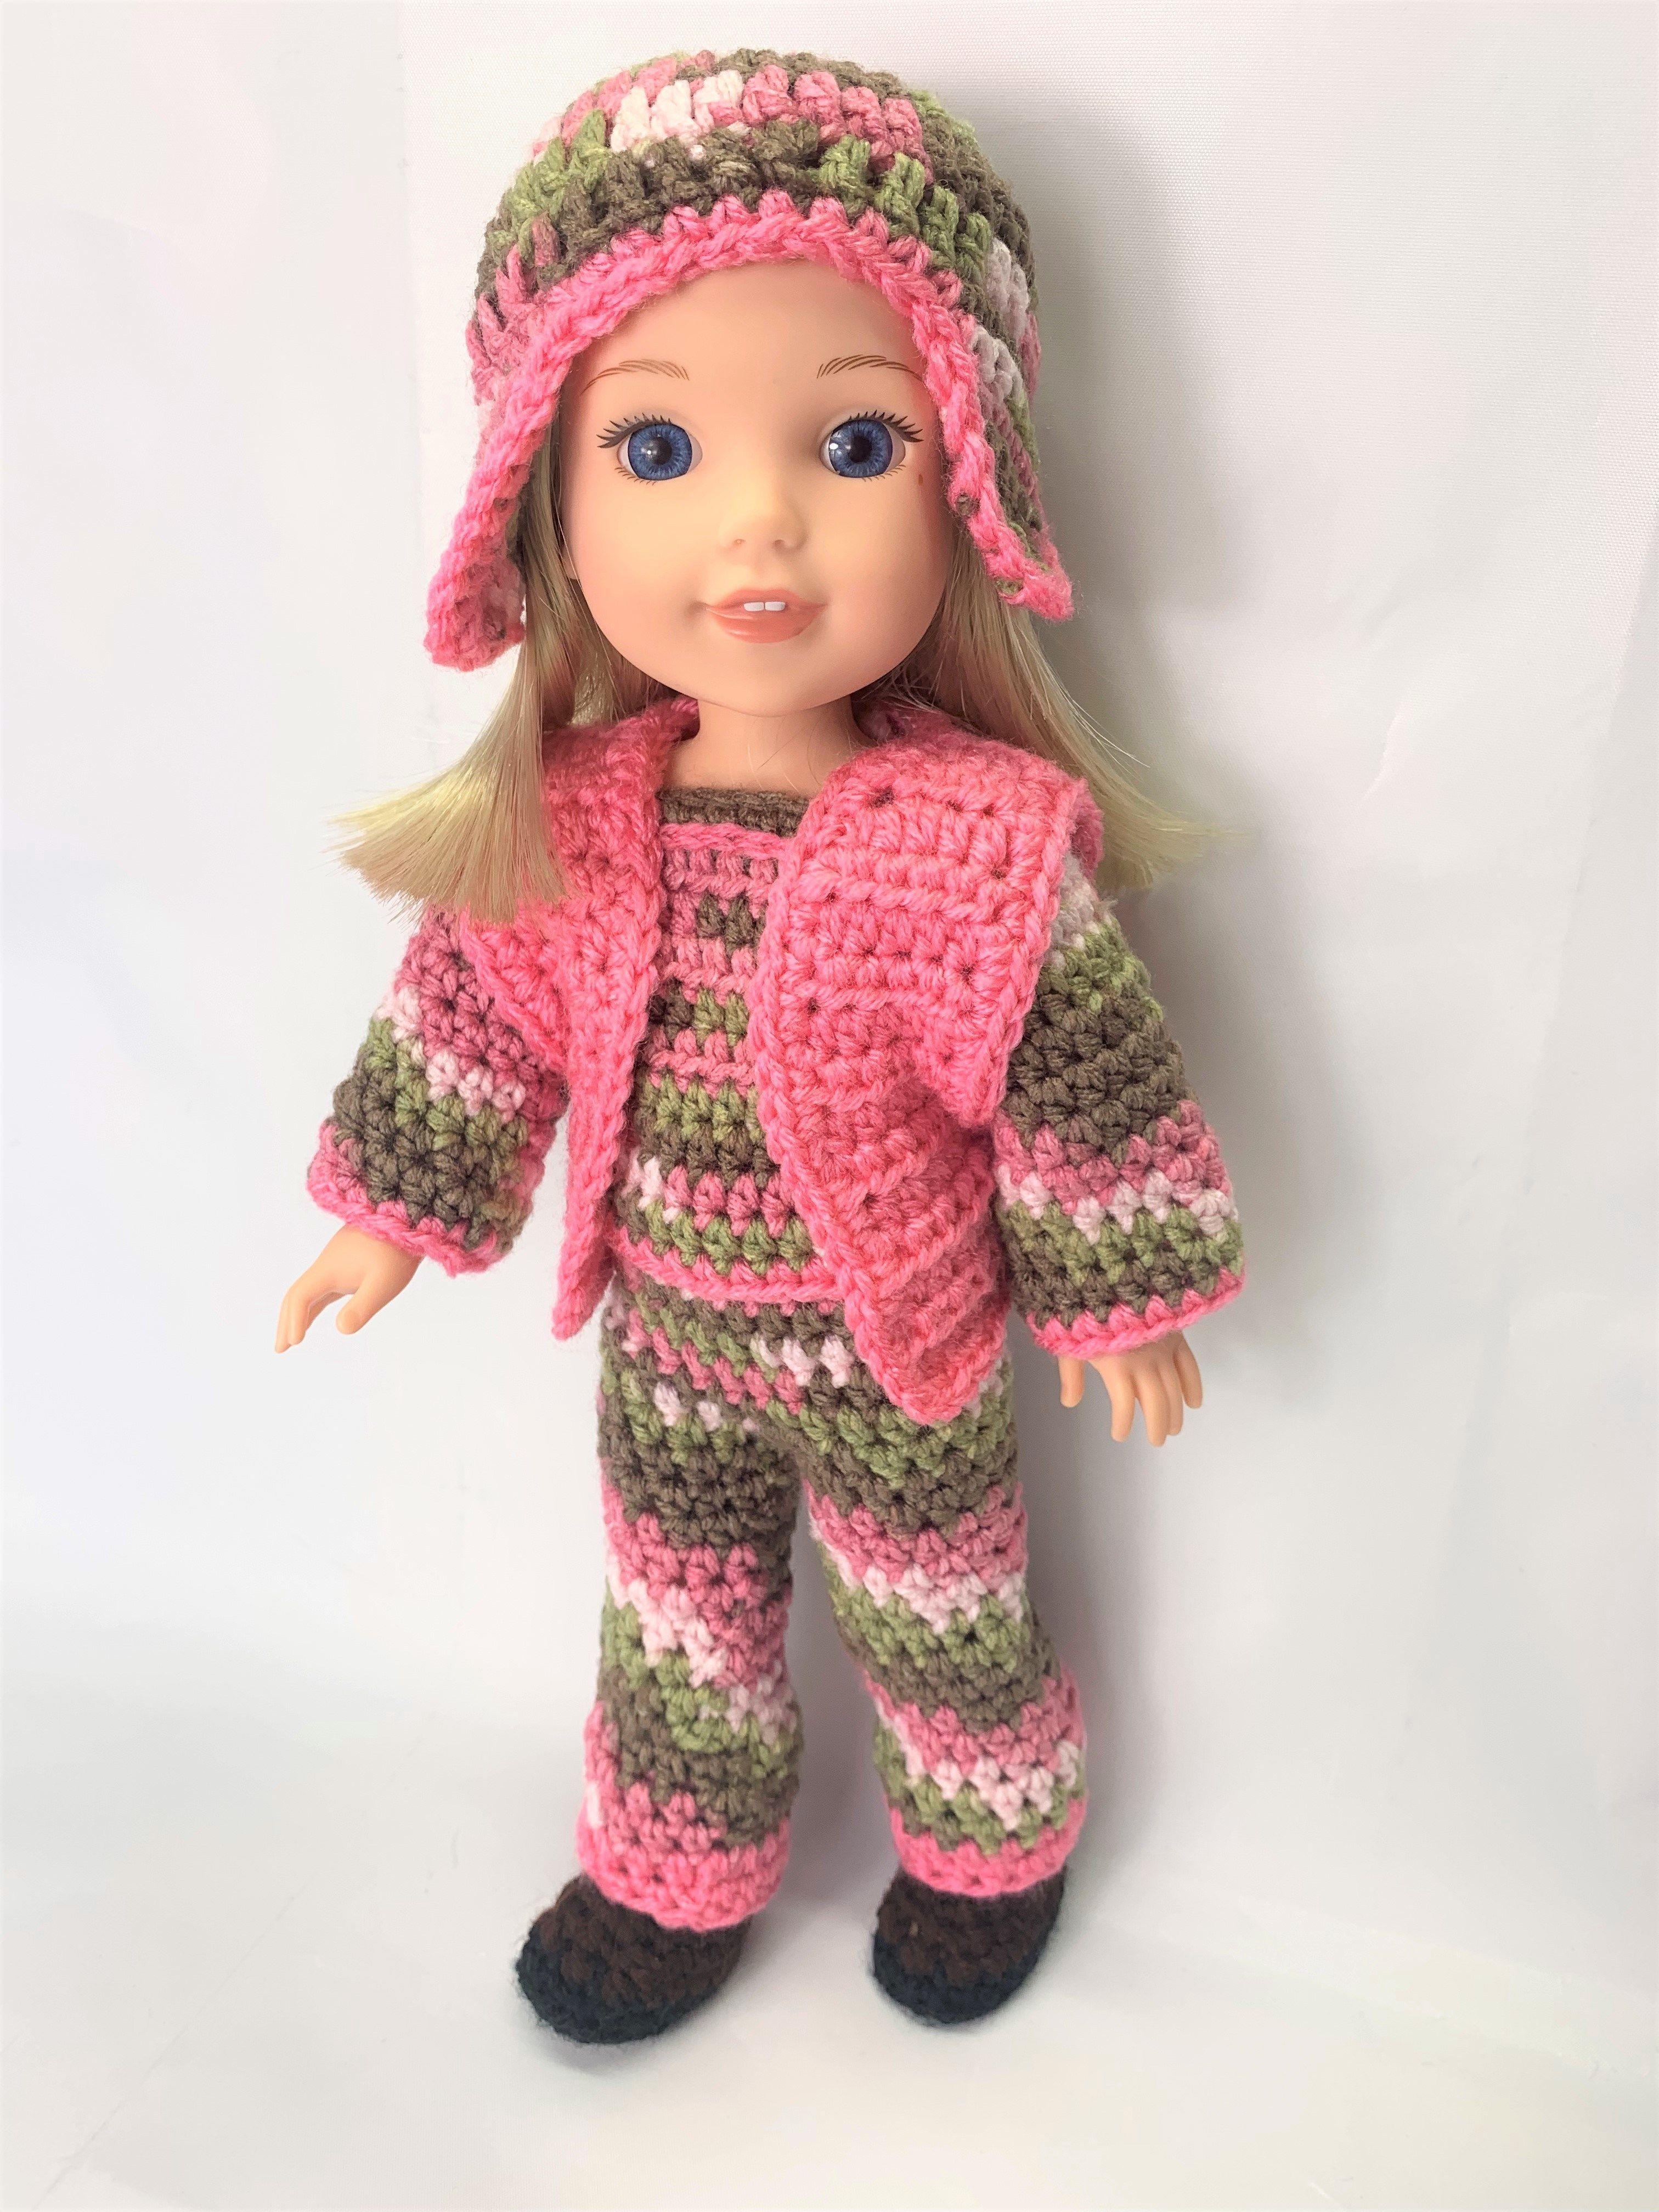 Good Night - Pajamas for 18 inch American Girl Doll